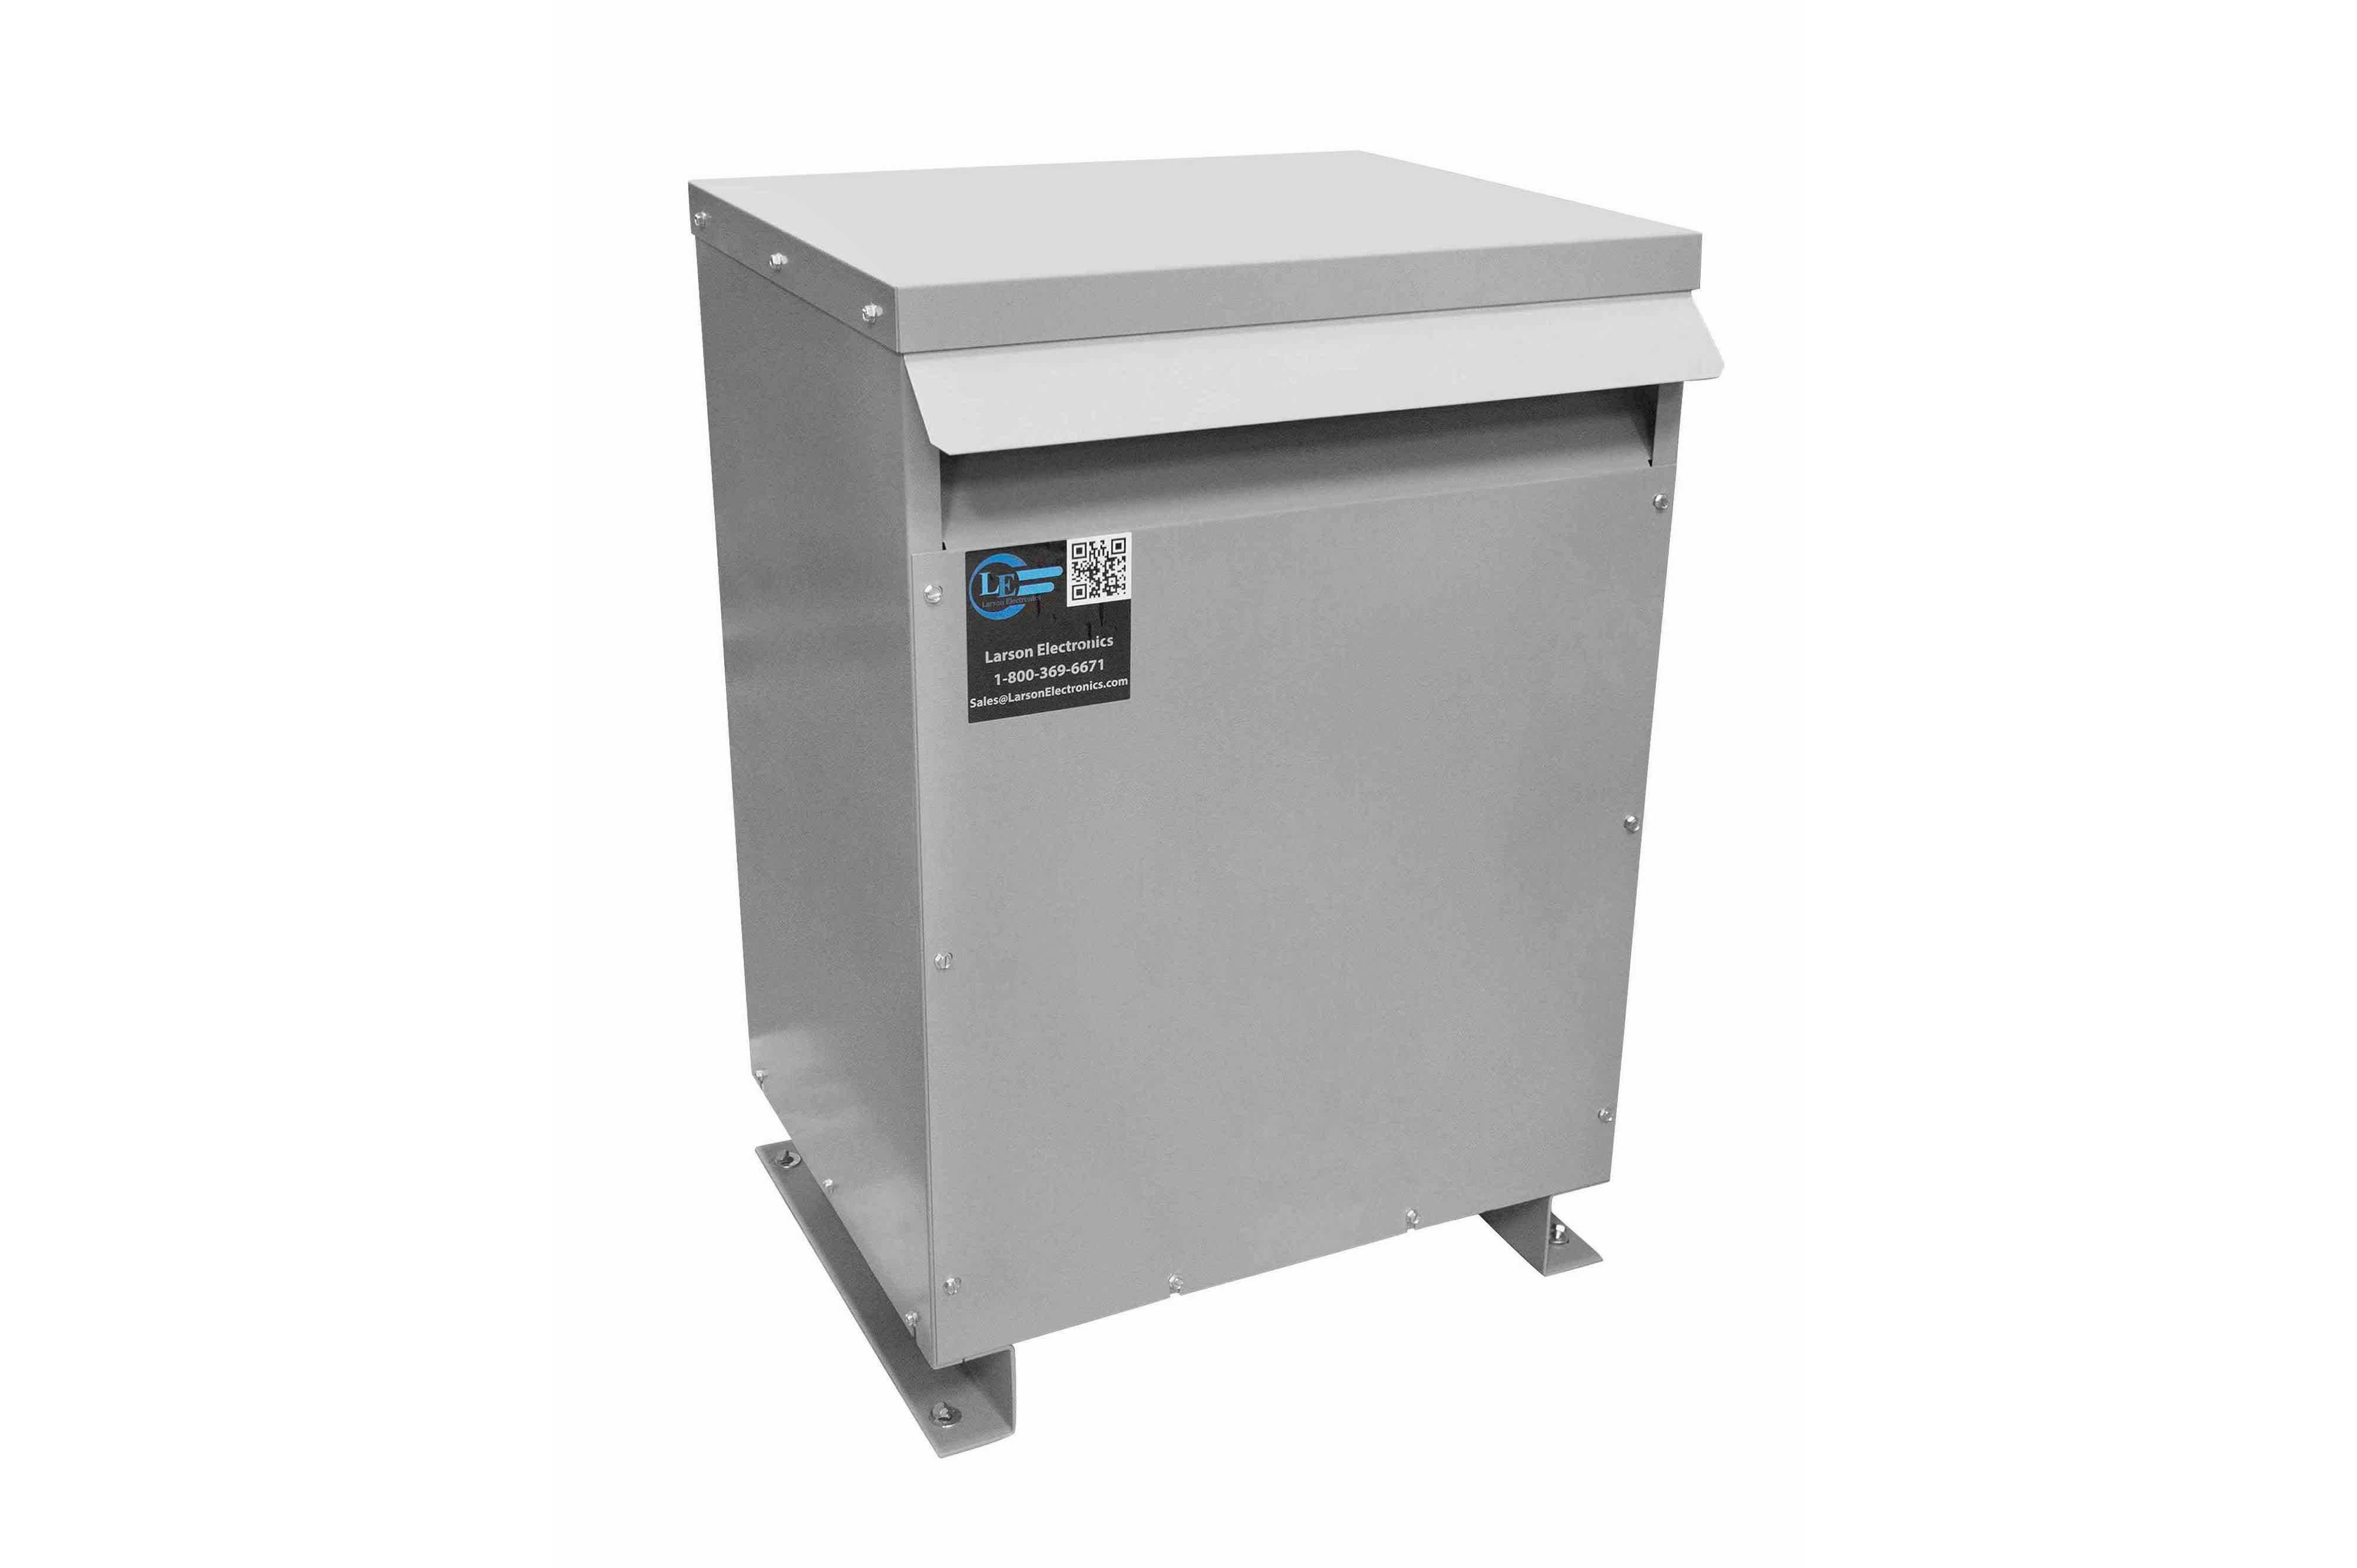 150 kVA 3PH Isolation Transformer, 440V Wye Primary, 240V/120 Delta Secondary, N3R, Ventilated, 60 Hz